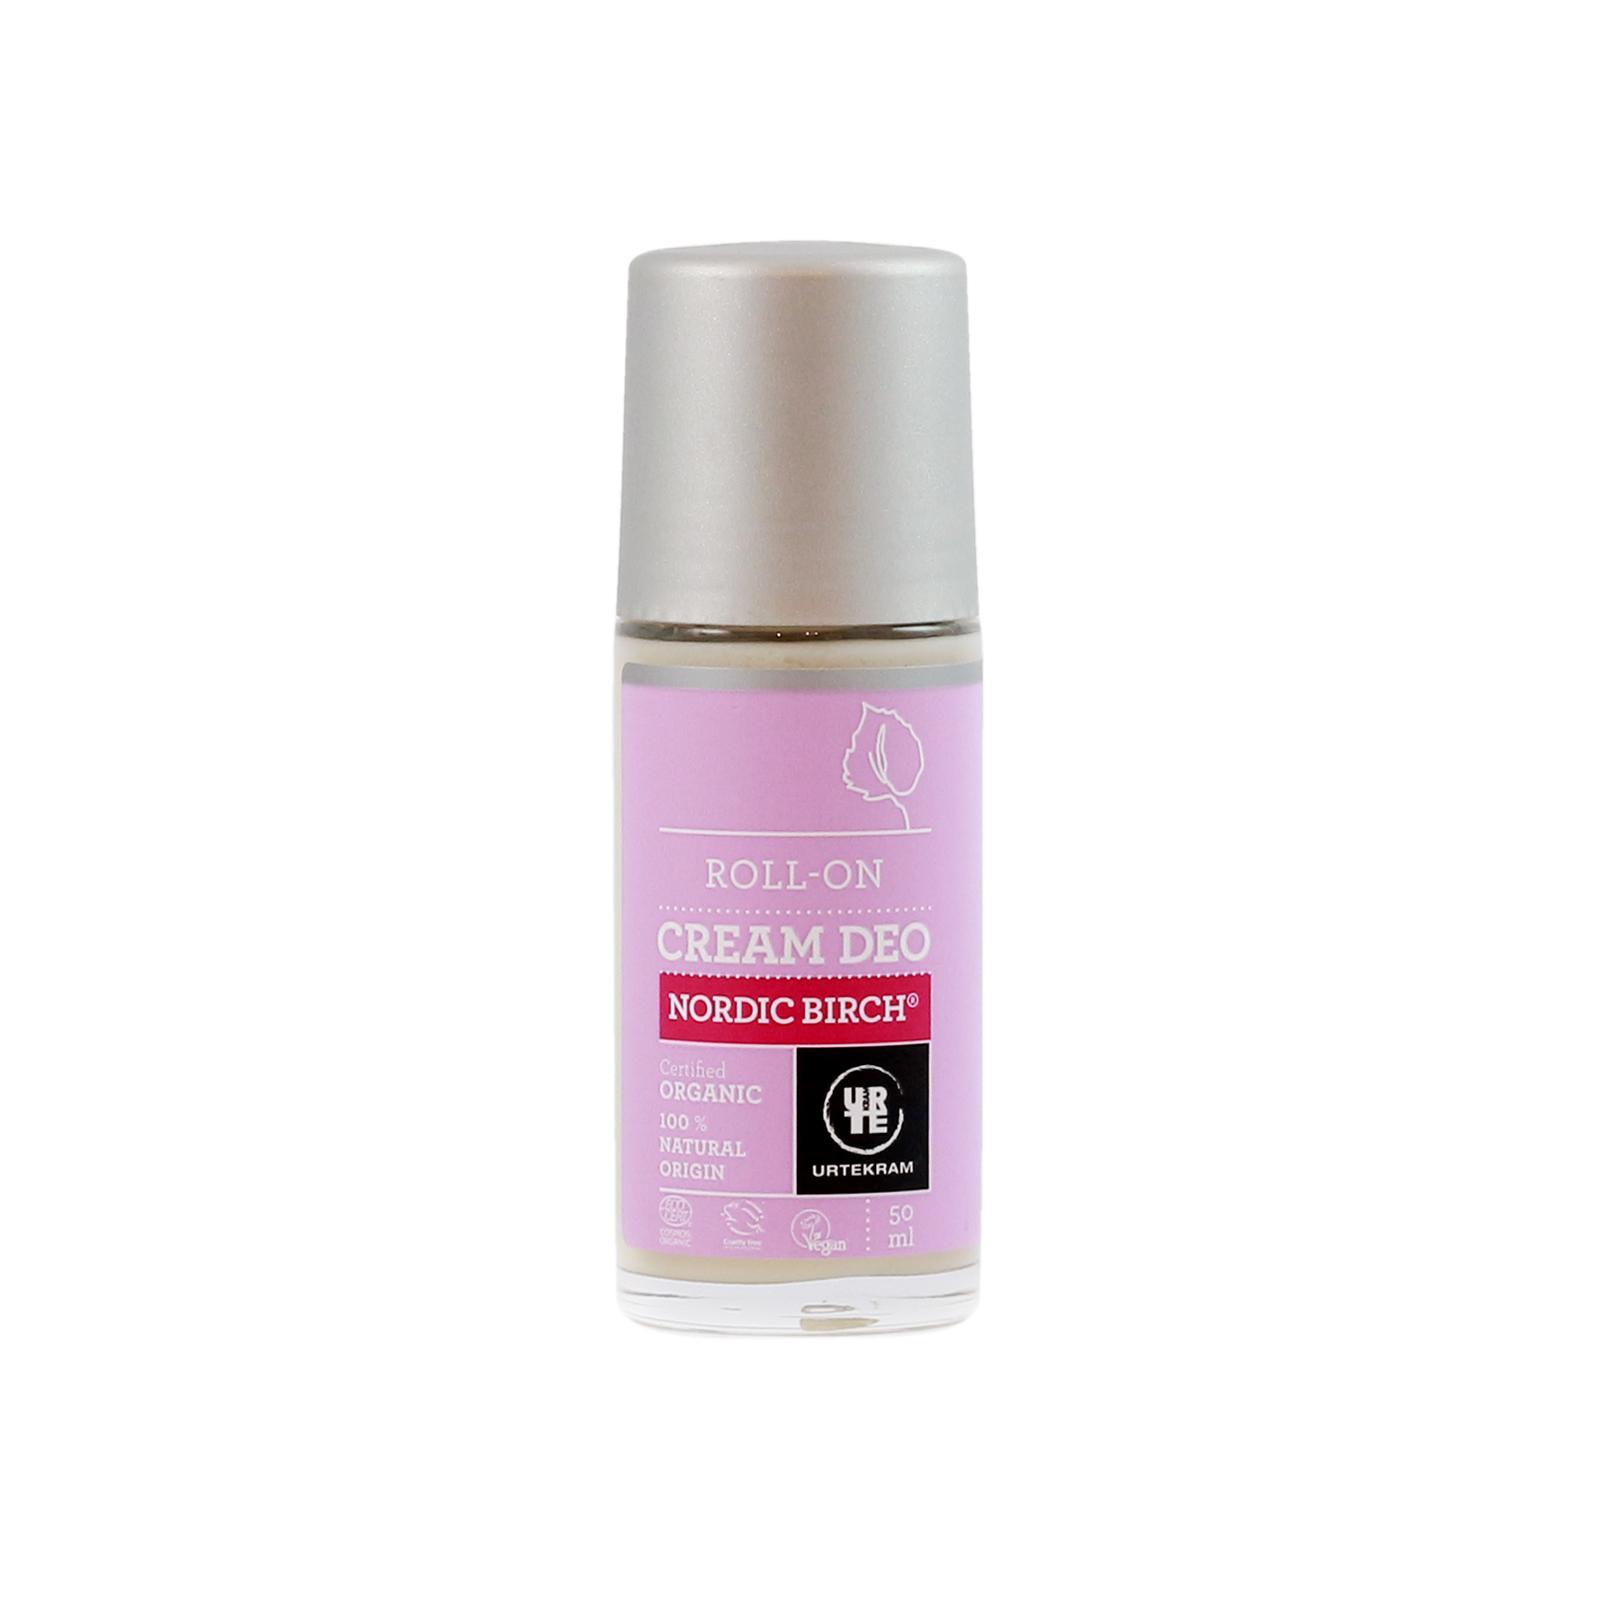 Urtekram Krémový deodorant, Severská bříza 50 ml